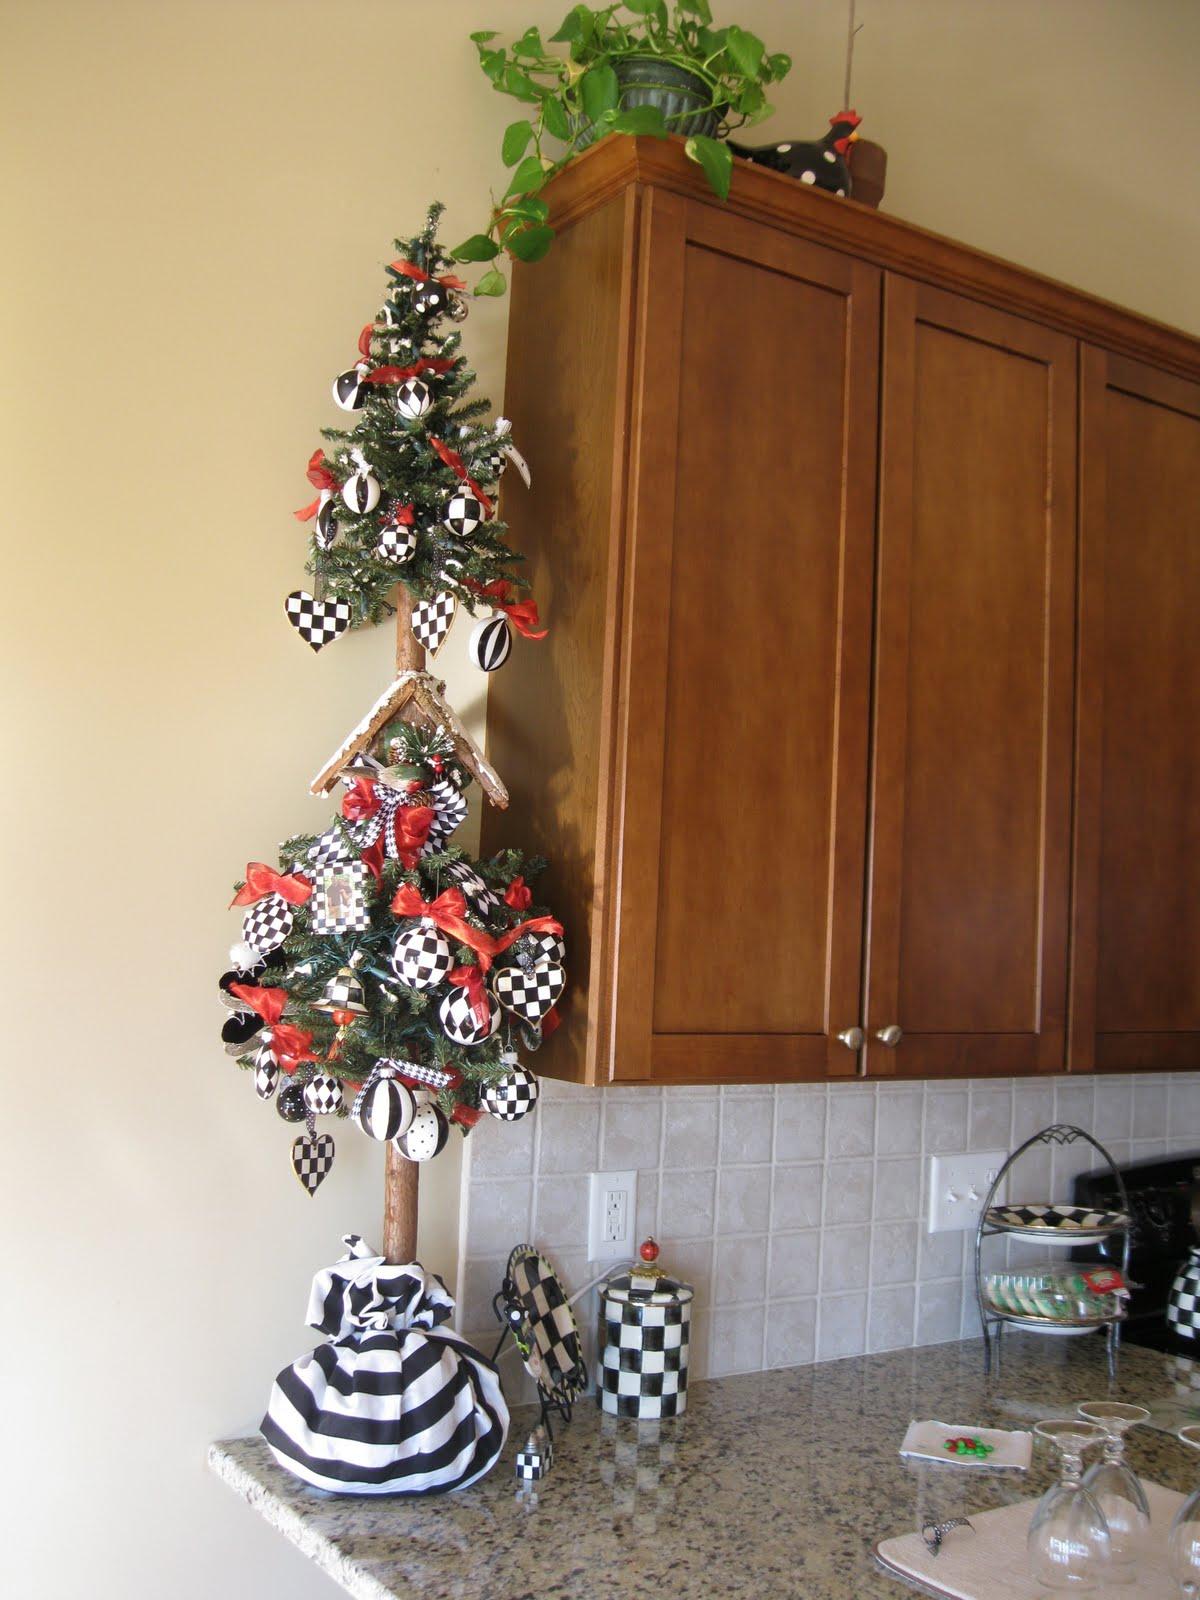 Pandora S Box Mackenzie Childs Knock Off Christmas Tree